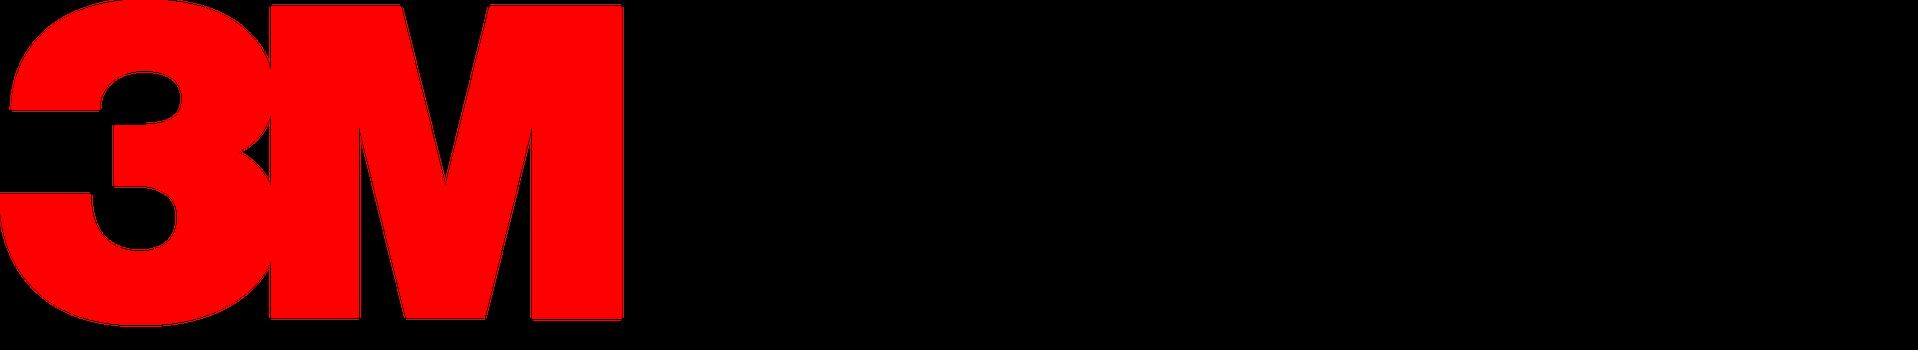 Science Centre | 3M Canada logo